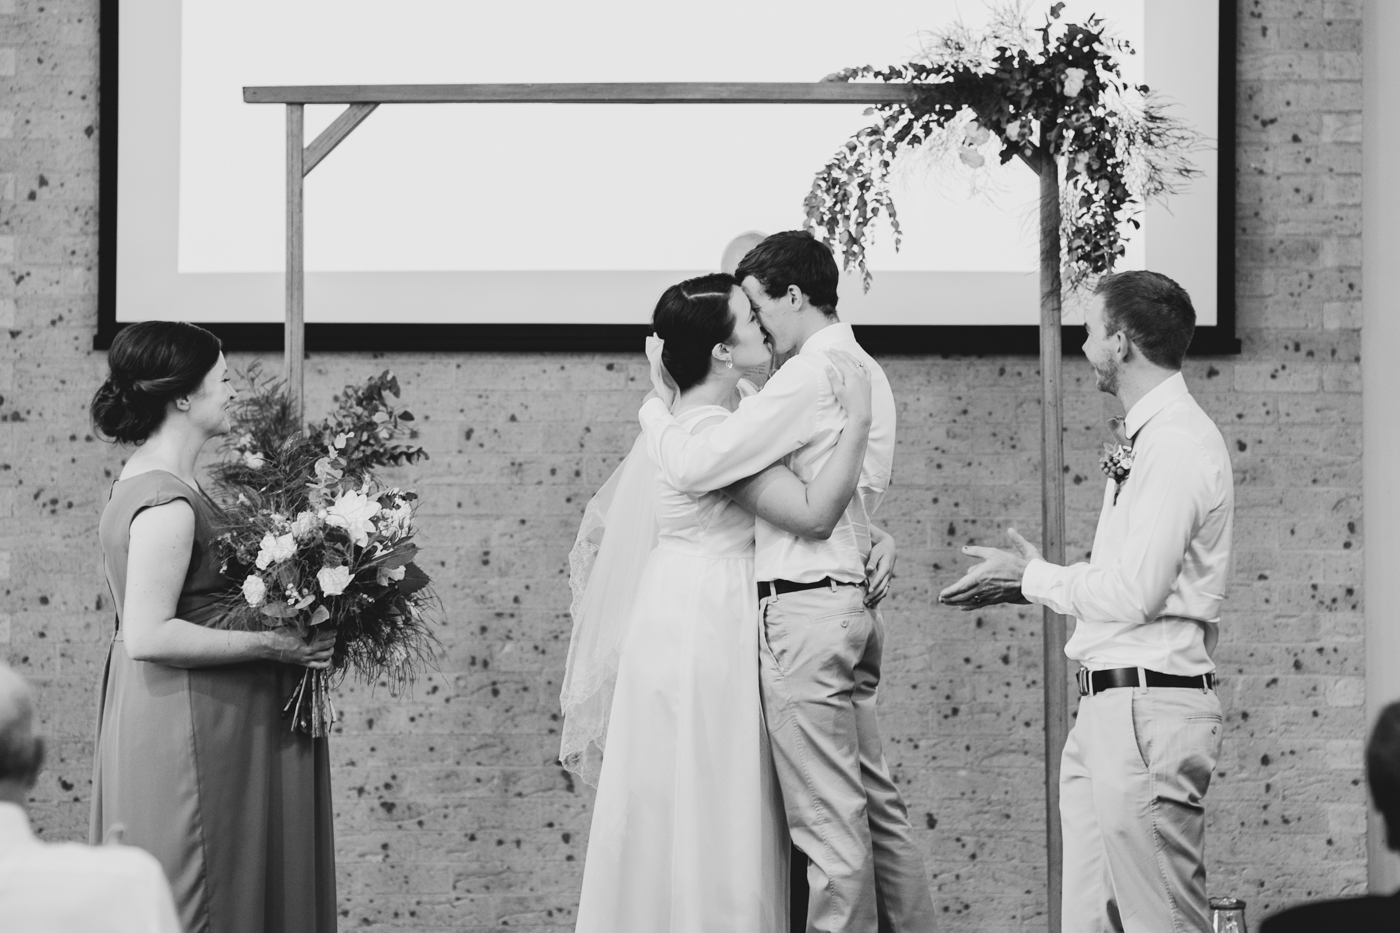 Nicolle & Jacob - Dubbo Wedding - Country Australia - Samantha Heather Photography-113.jpg